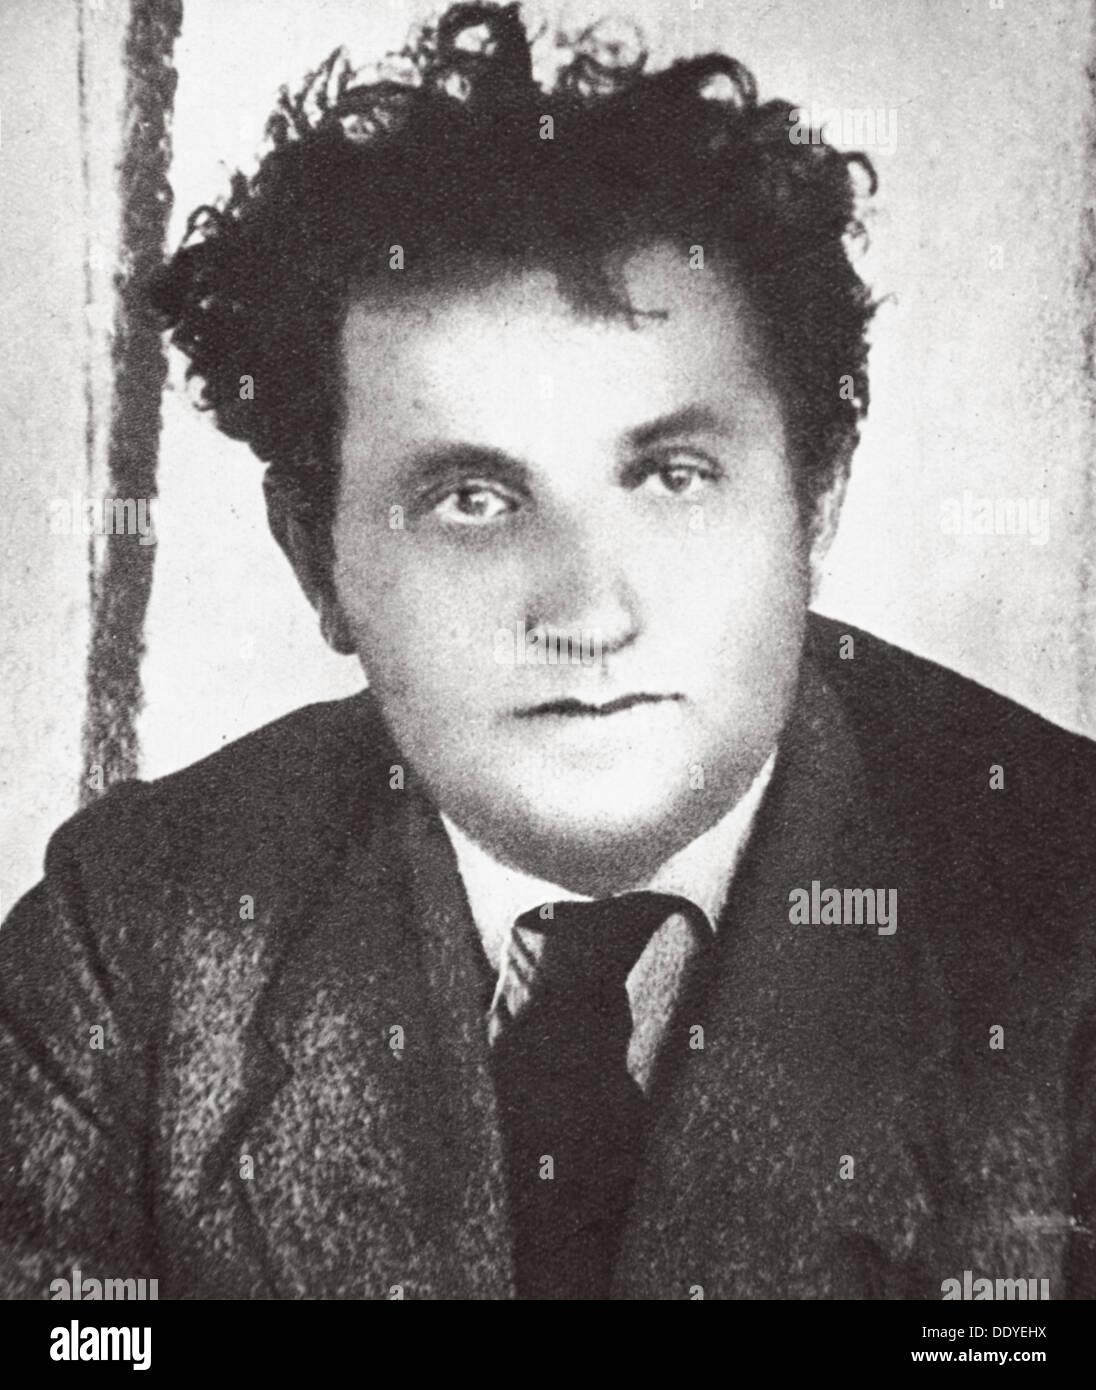 Grigory  Zinoviev, Russian Bolshevik revolutionary and Soviet politician, 1924 Artist: Unknown - Stock Image